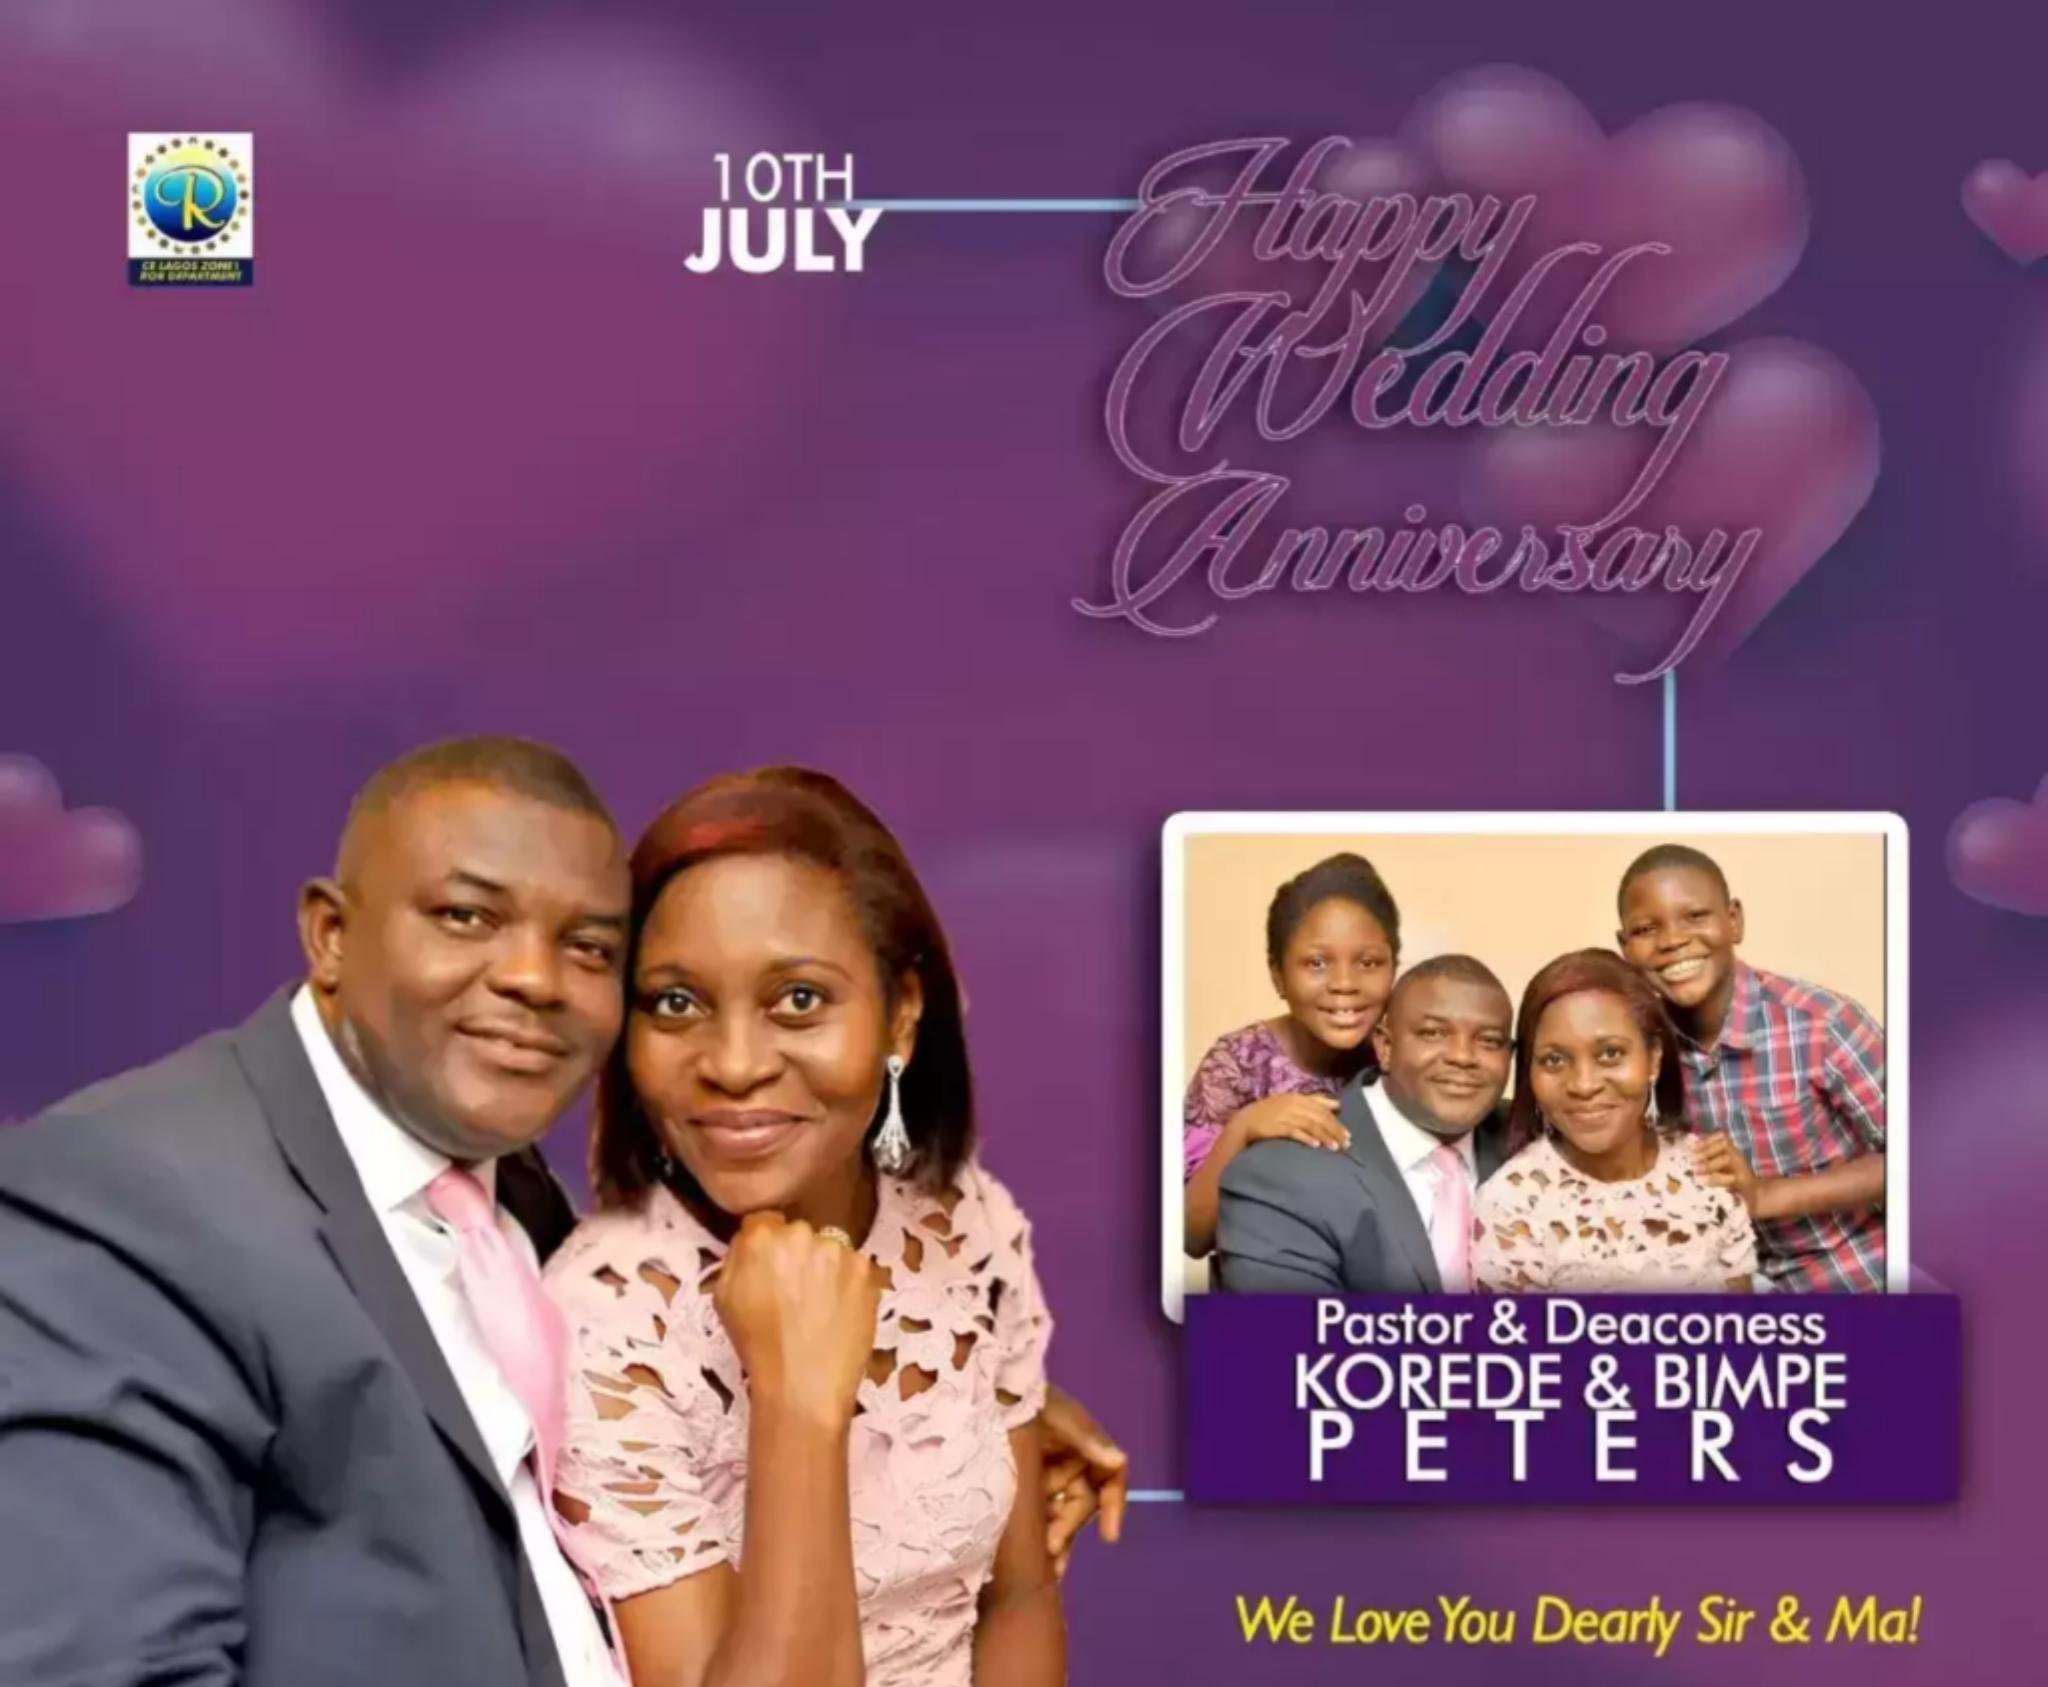 Happy wedding Anniversary dear esteemed